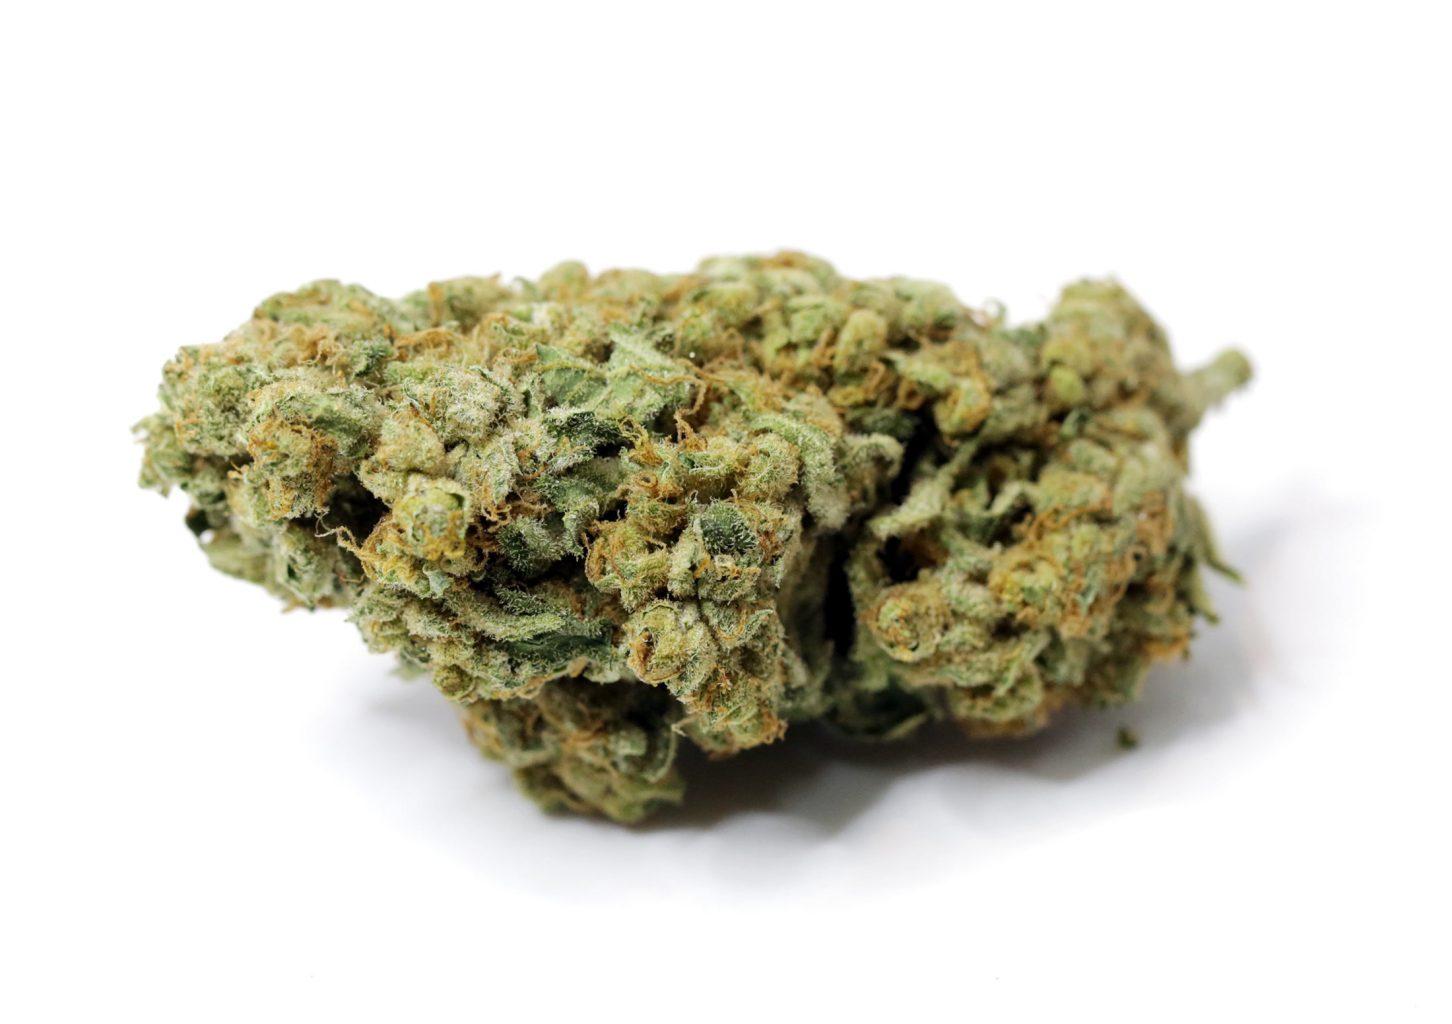 Cannabis Strain of the Week: CBD Spider Bud (Charlotte's Web)